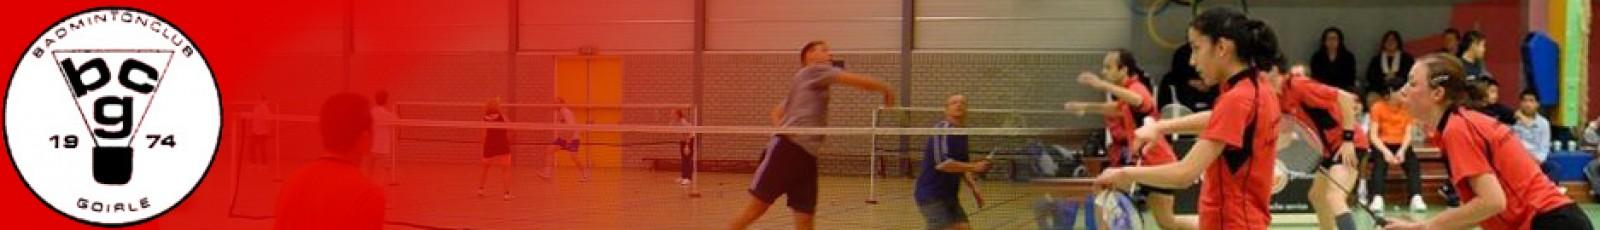 Badminton Club Goirle